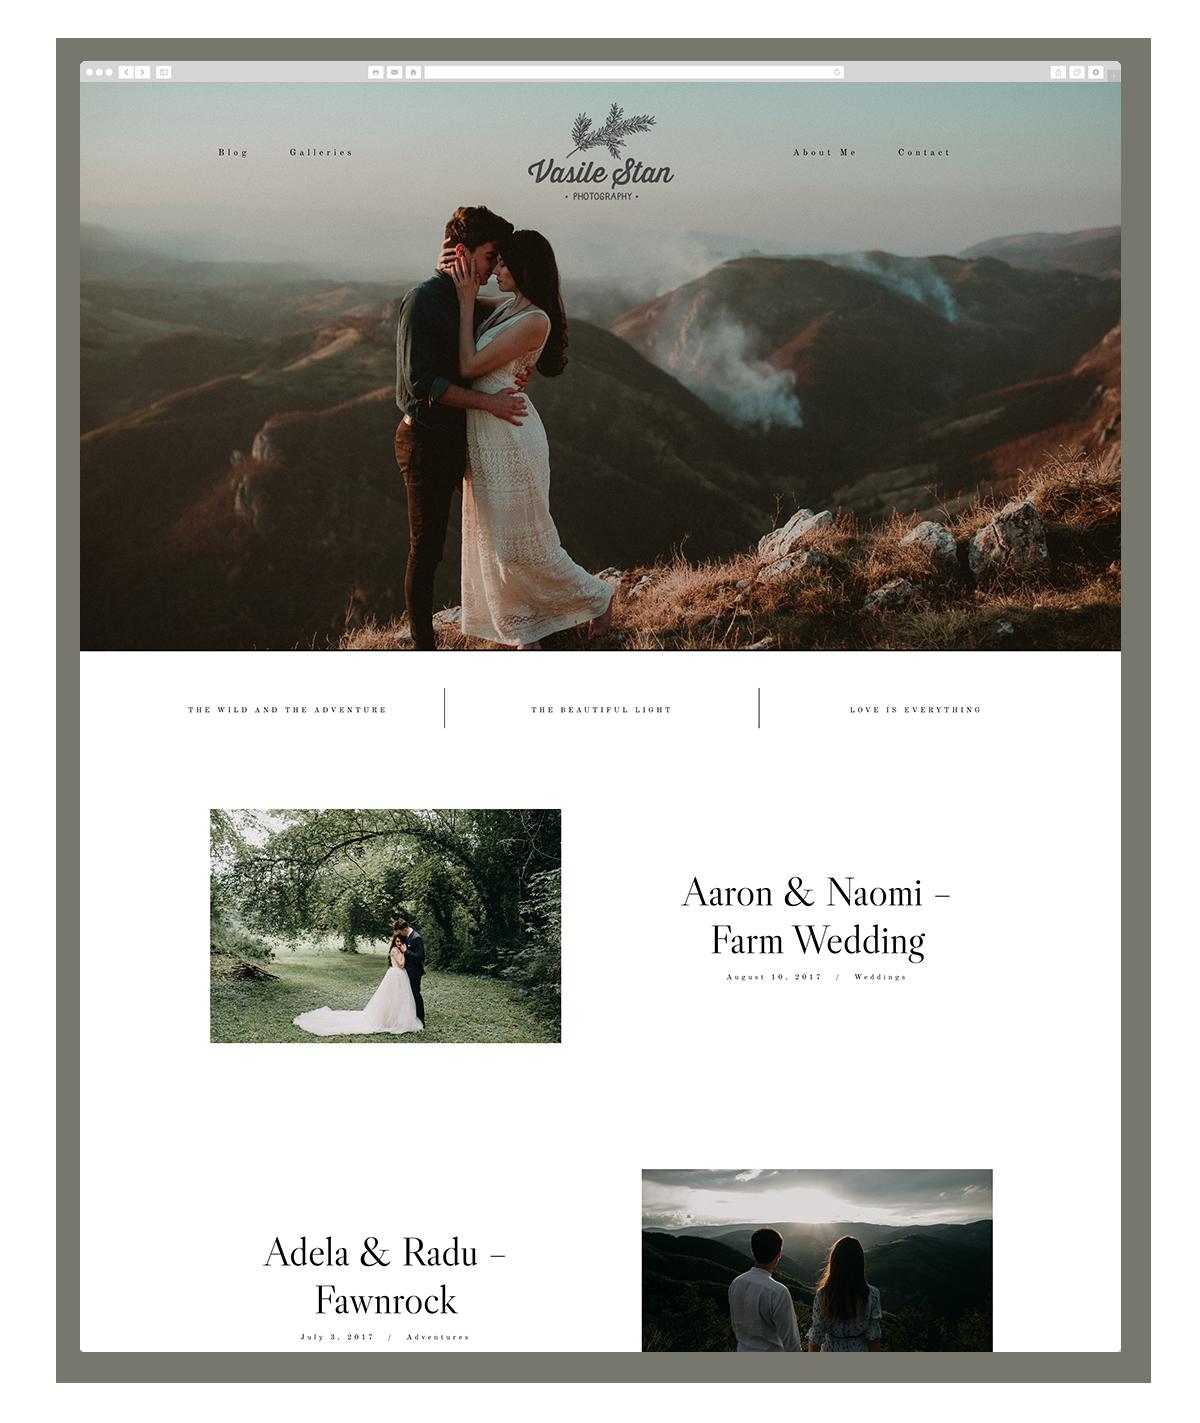 kyoto-website design, theme, wedding photography, site design, flothemes-vasile-stan